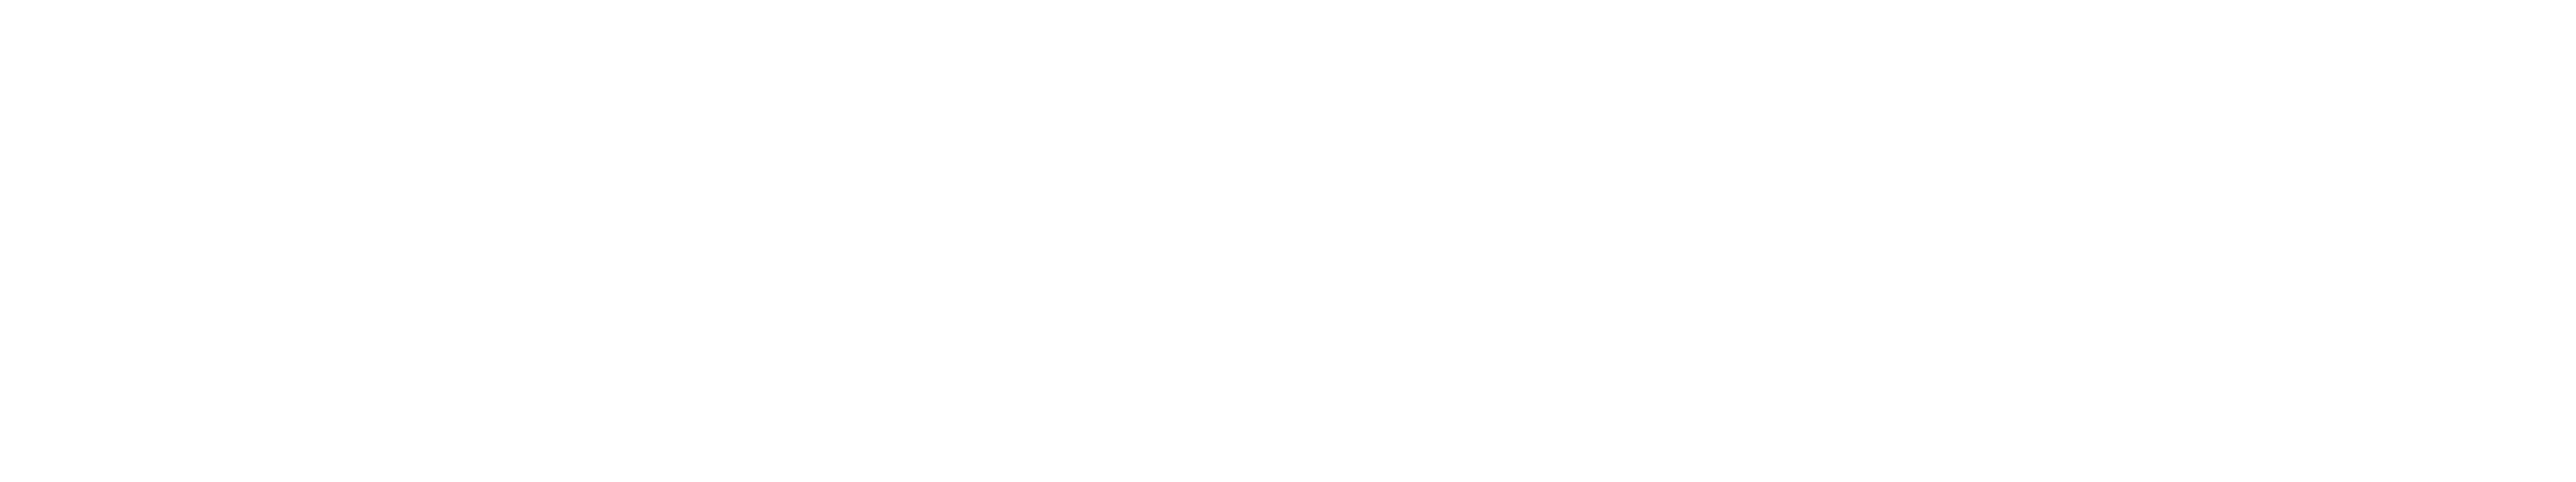 logo-sfu-weiterbildungsakademie